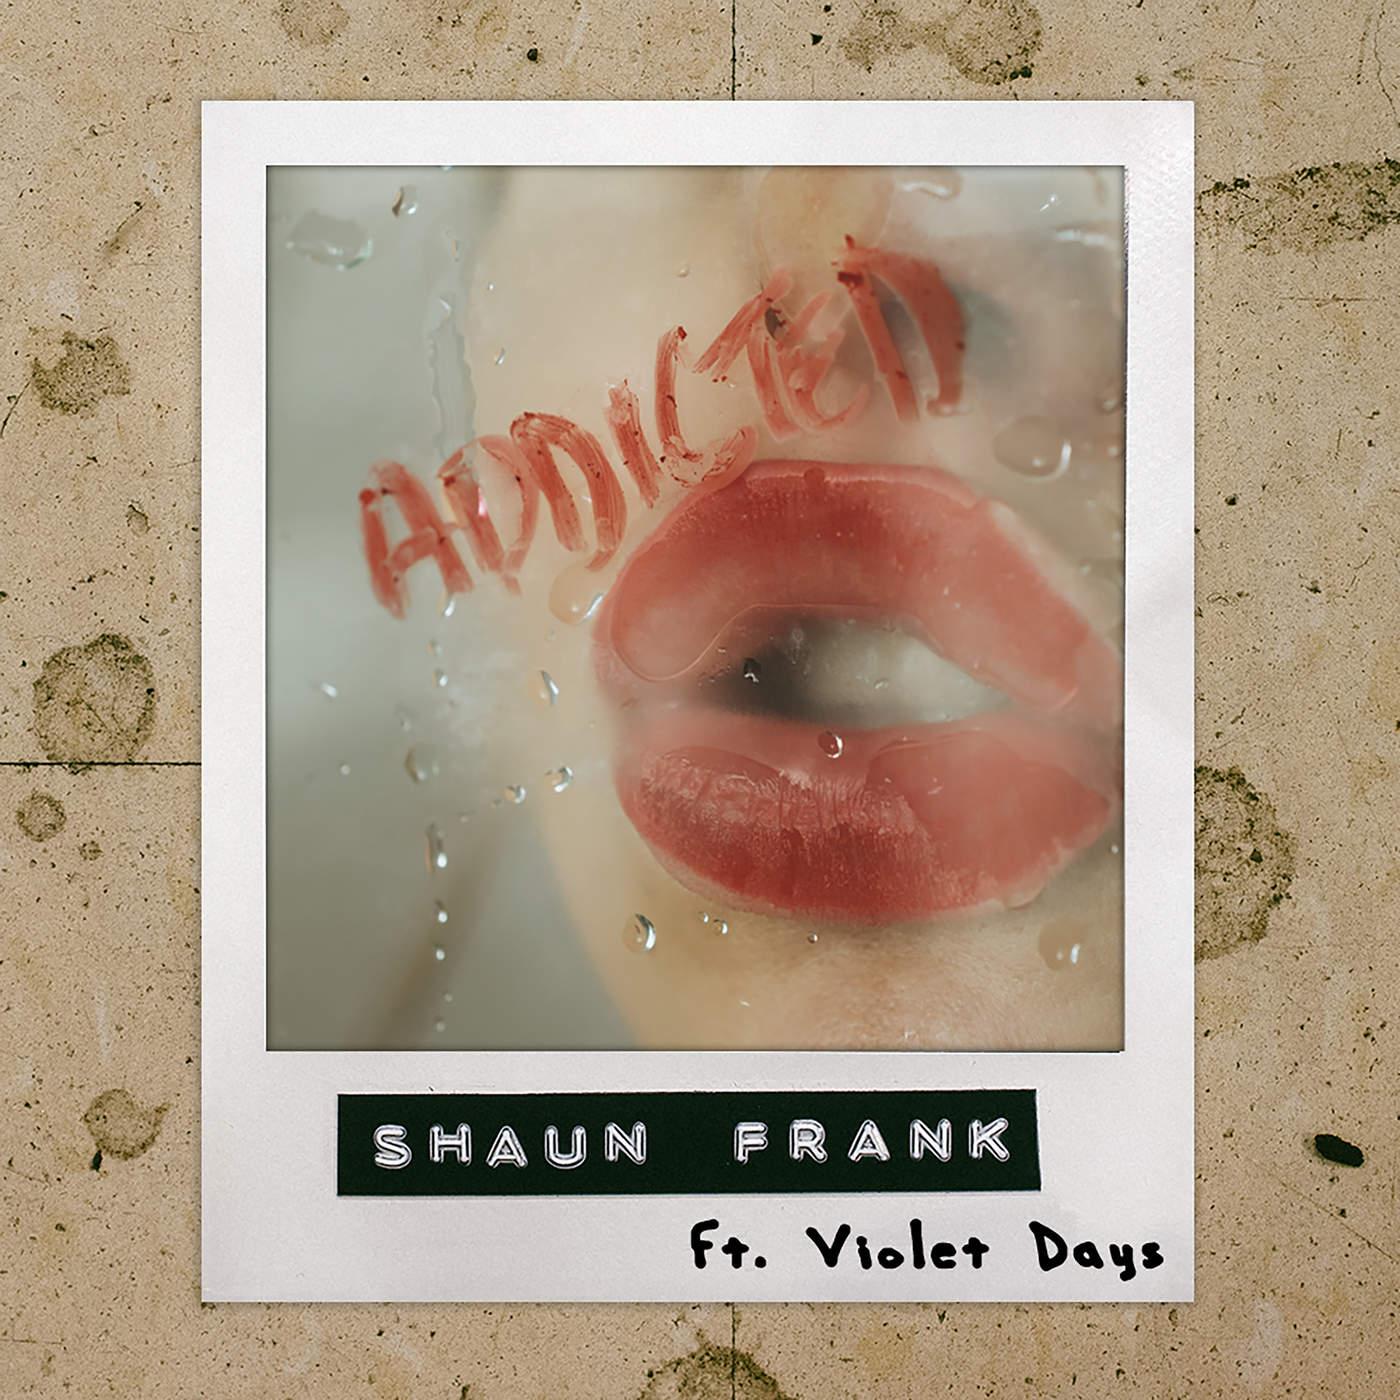 Shaun Frank - Addicted (feat. Violet Days) - Single